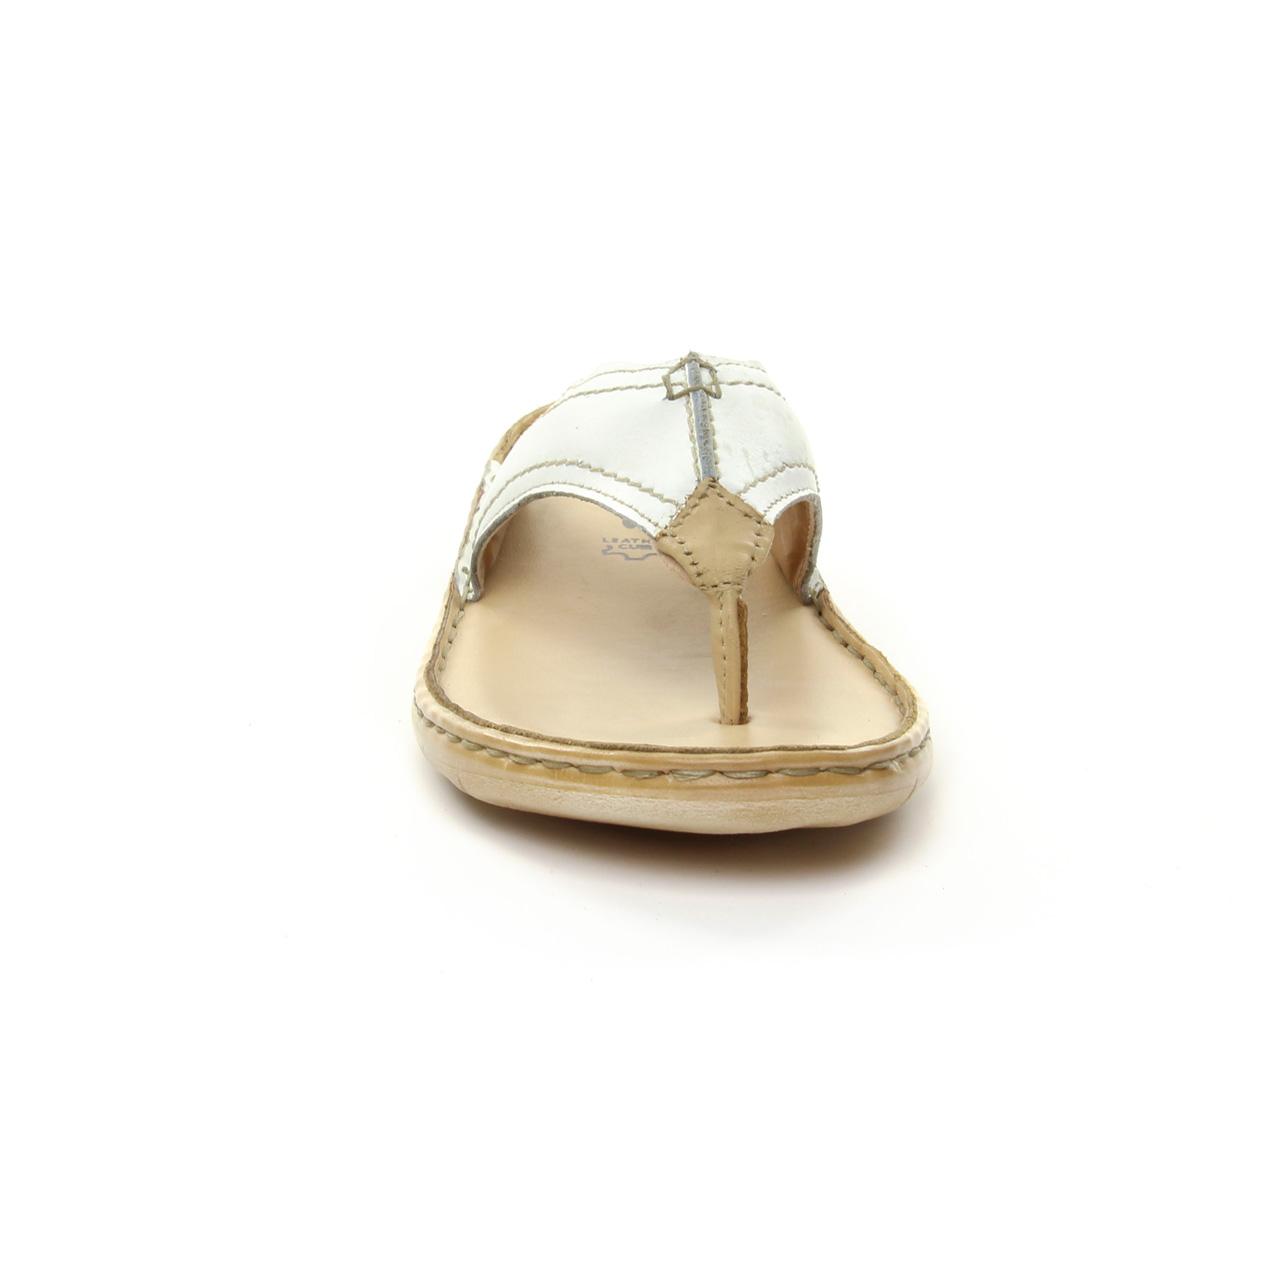 Tamaris 27210 White Sand | sandales blanc beige printemps